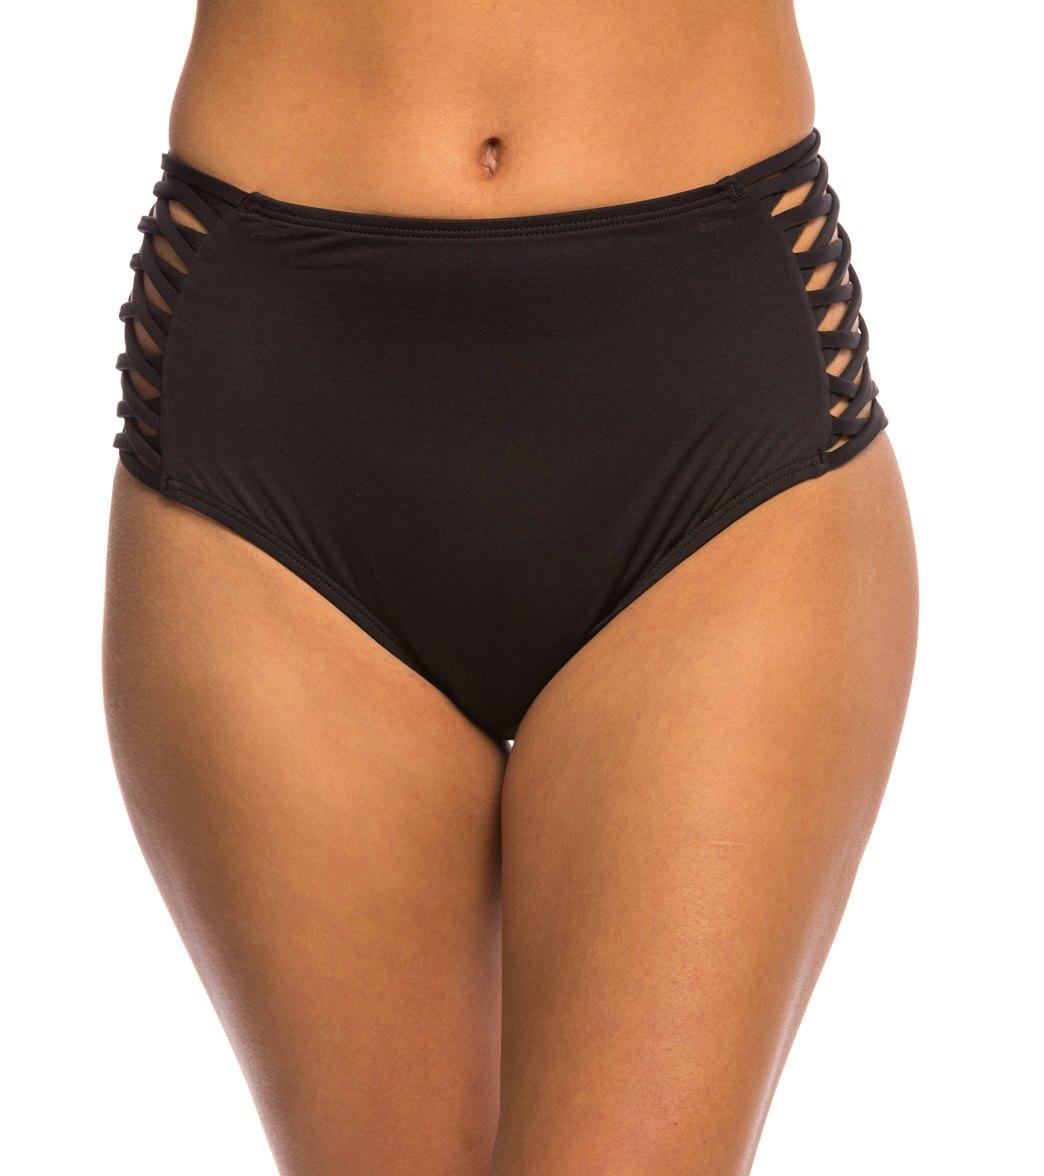 ad2f7728aecb ... L-Space Swimwear Sensual Solids Tigress High Waist Bottom. Play Video.  Play Video